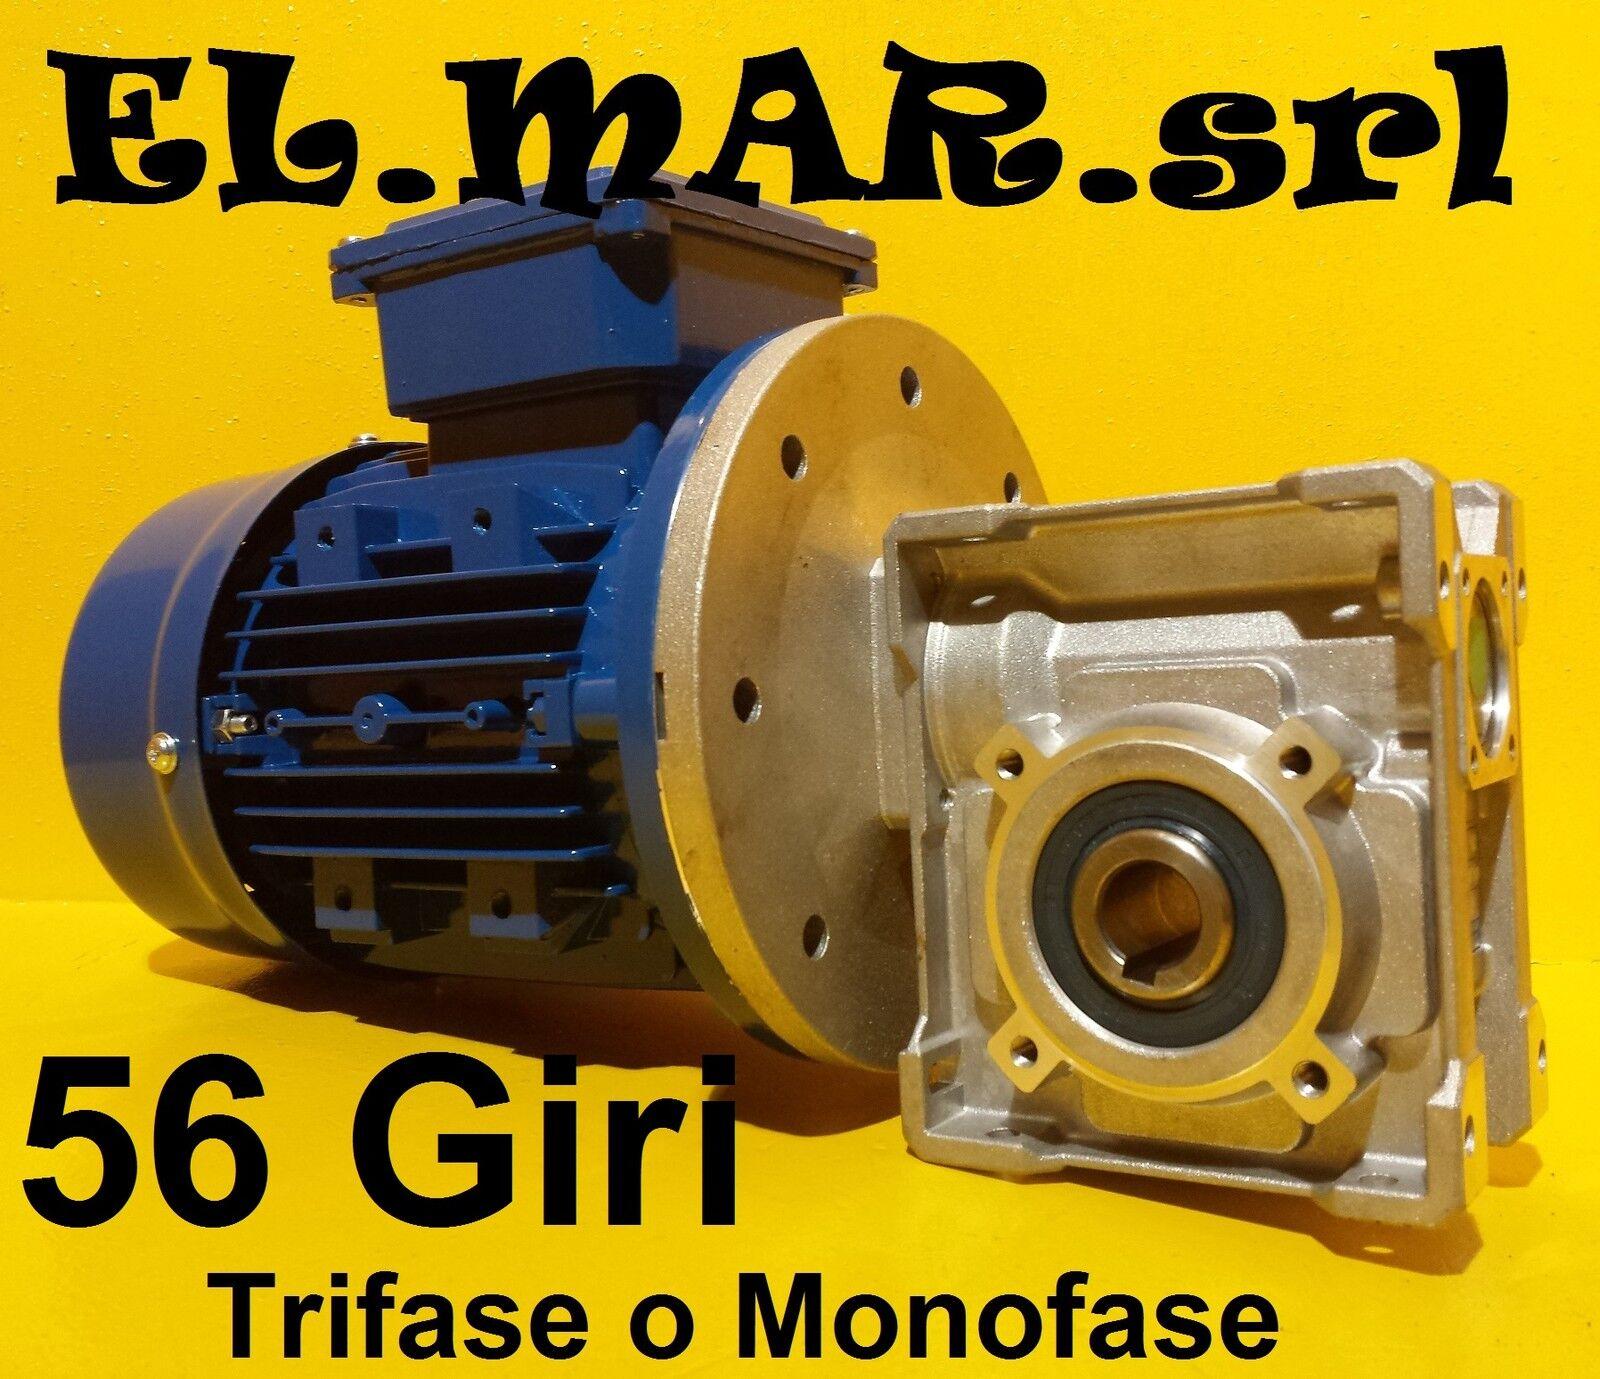 Motoriduttore 56 Giri HP 0,5 Riduttore di giri Motore Monofase Trifase Kw 0,37